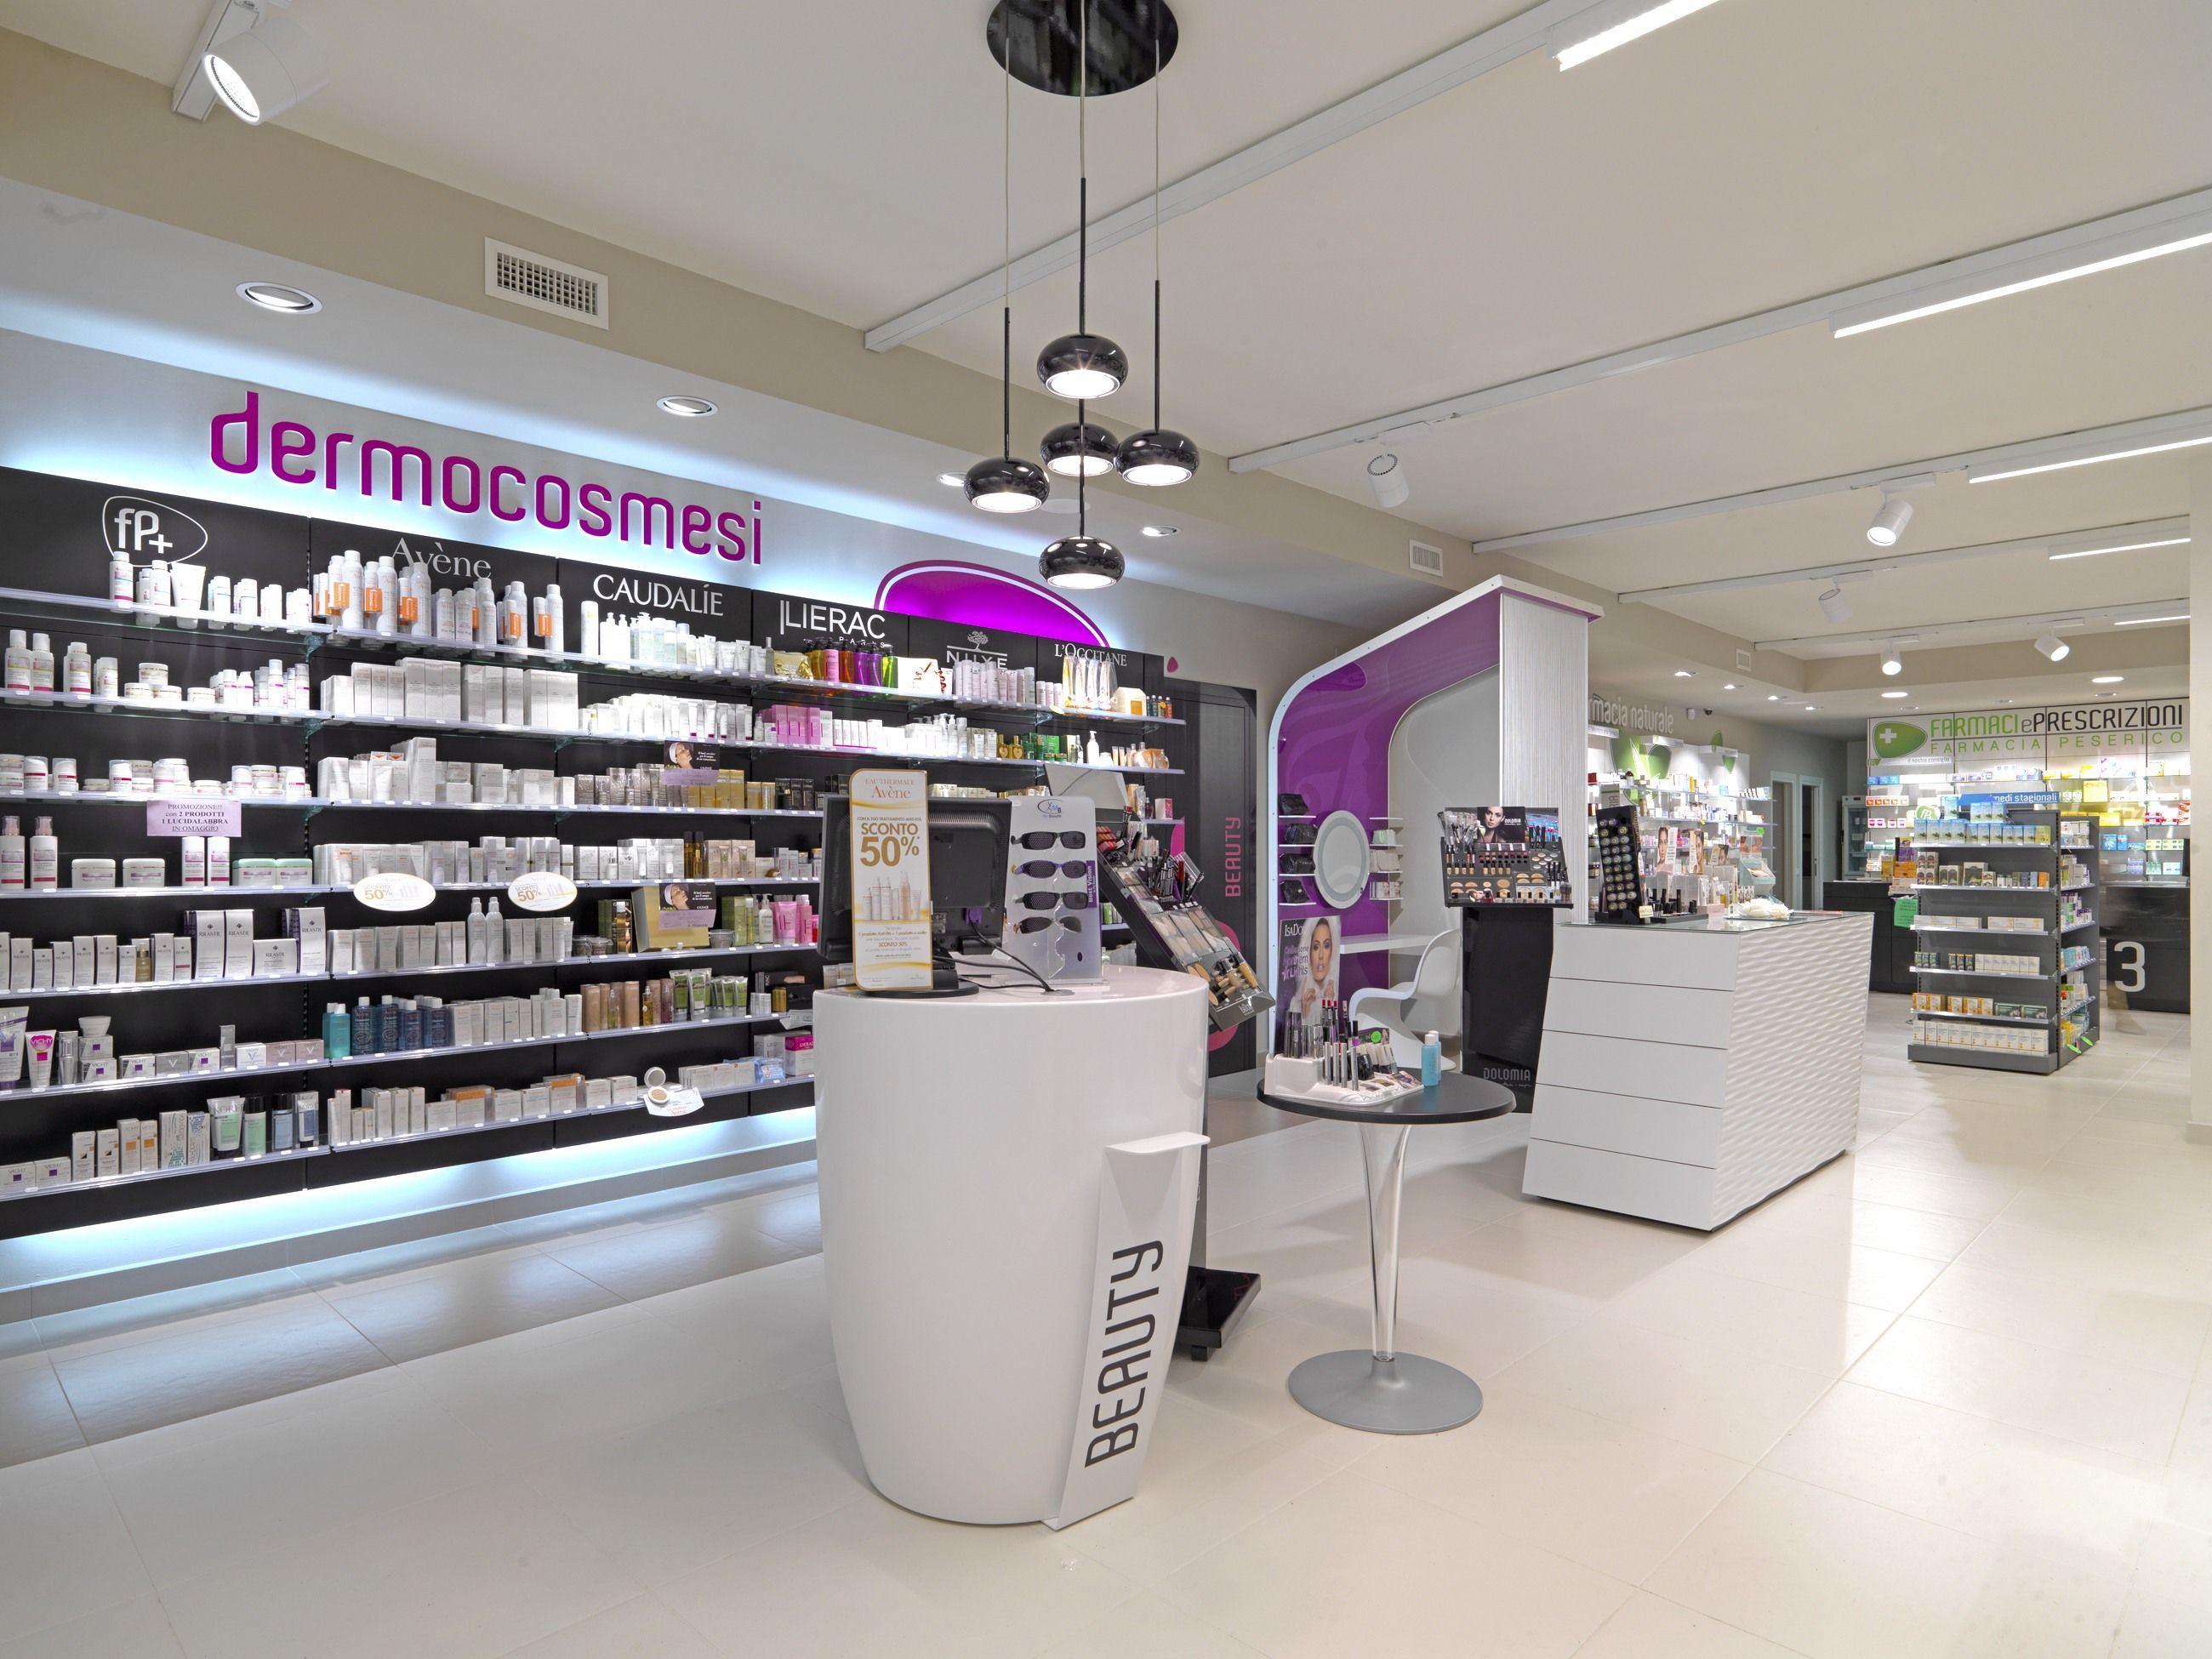 pharmacy design retail design store design pharmacy shelving pharmacy furniture - Pharmacy Design Ideas